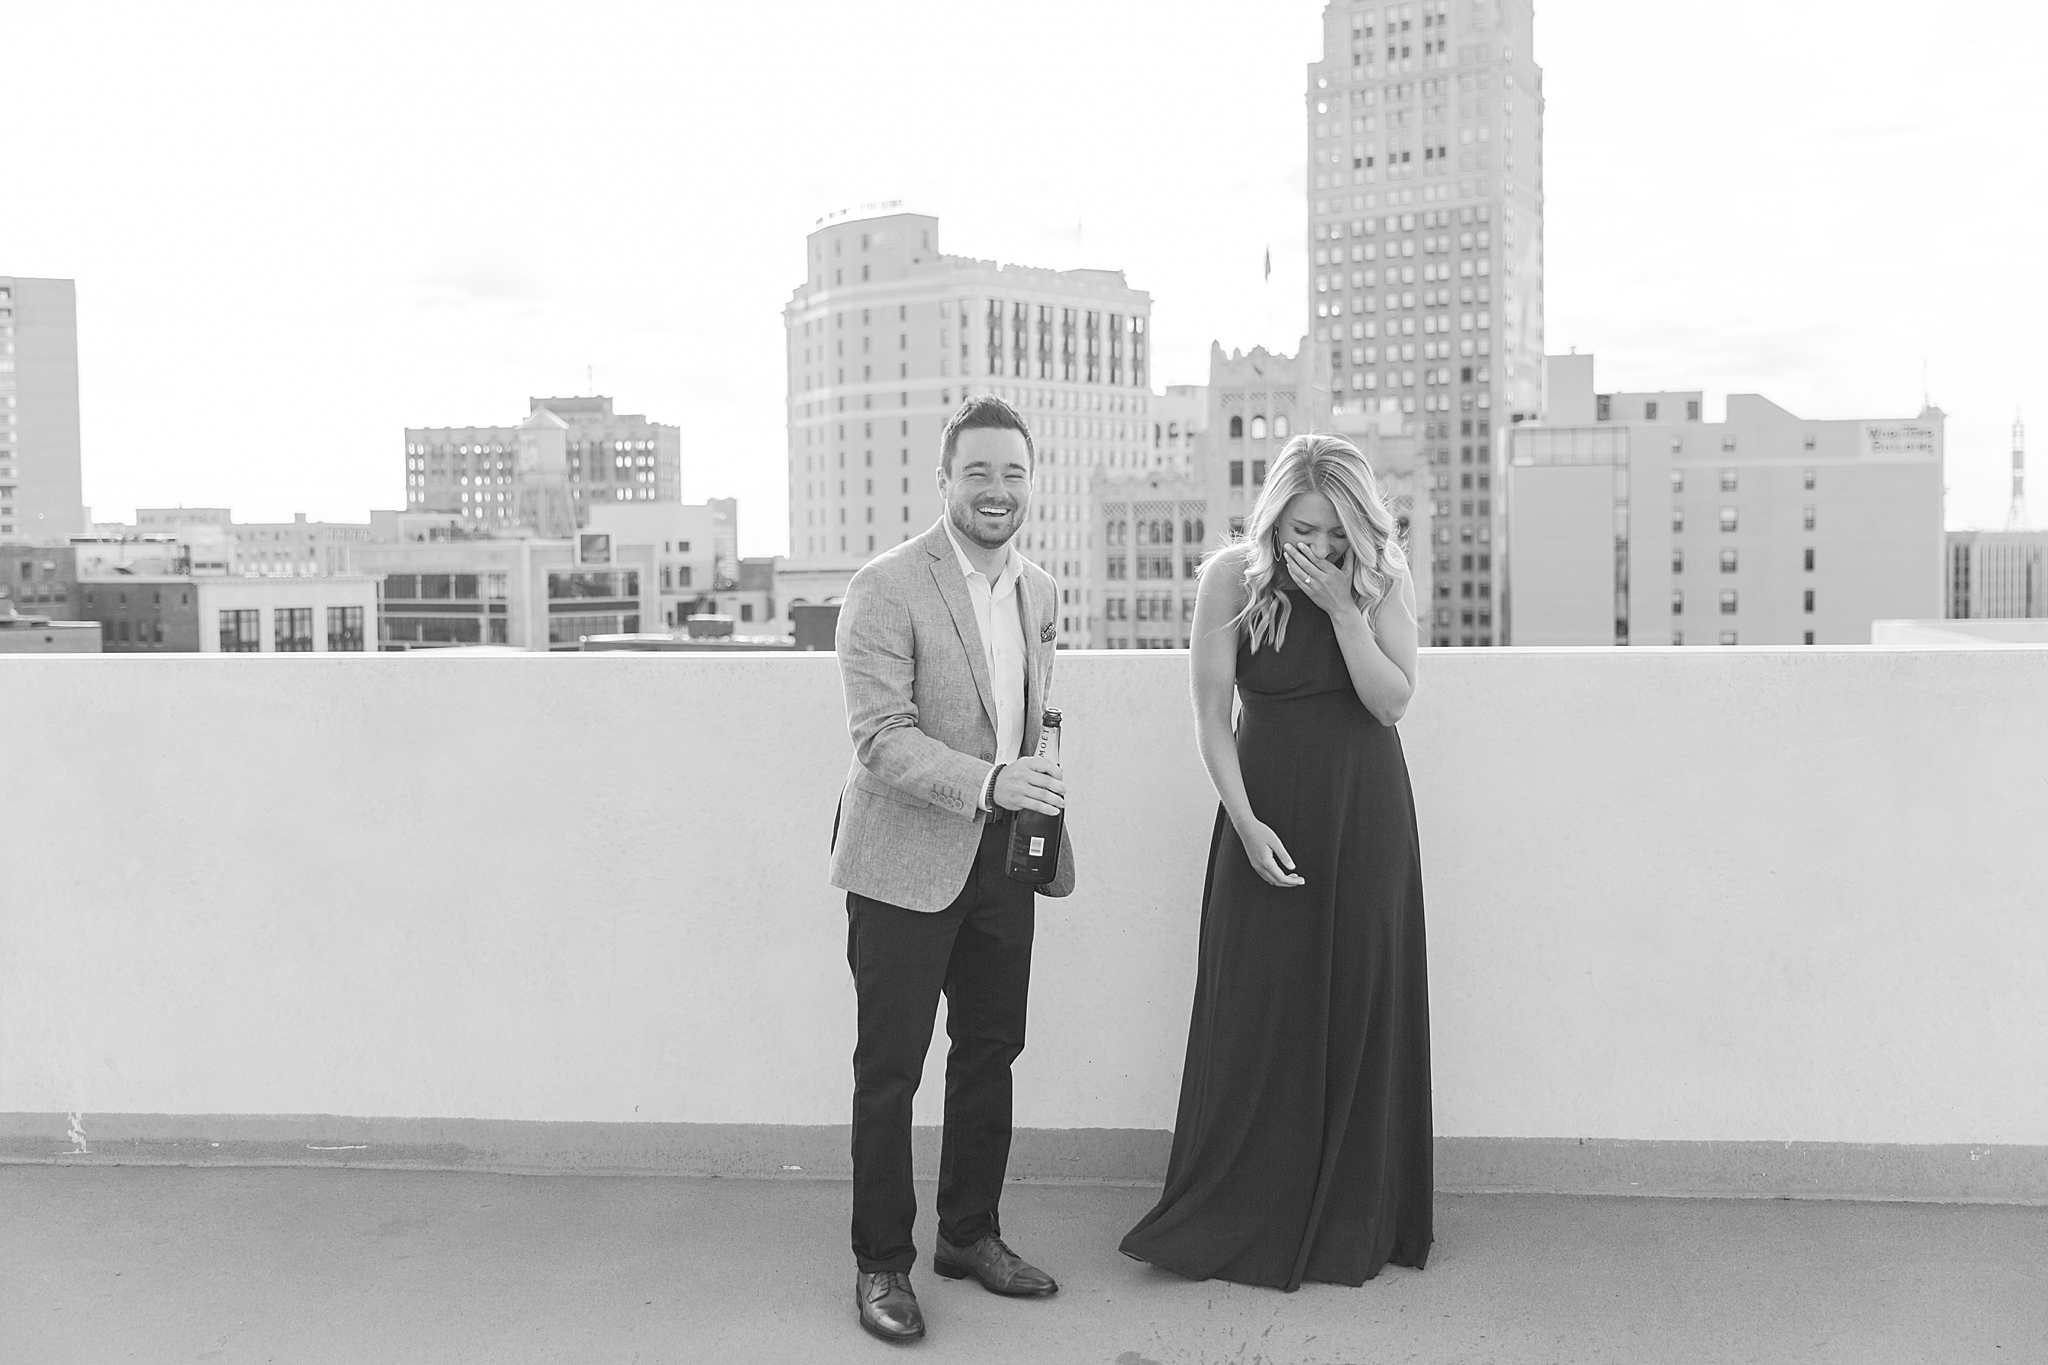 detroit-wedding-photographer-downtown-detroit-belle-isle-engagement-photos-sarah-eric-by-courtney-carolyn-photography_0011.jpg